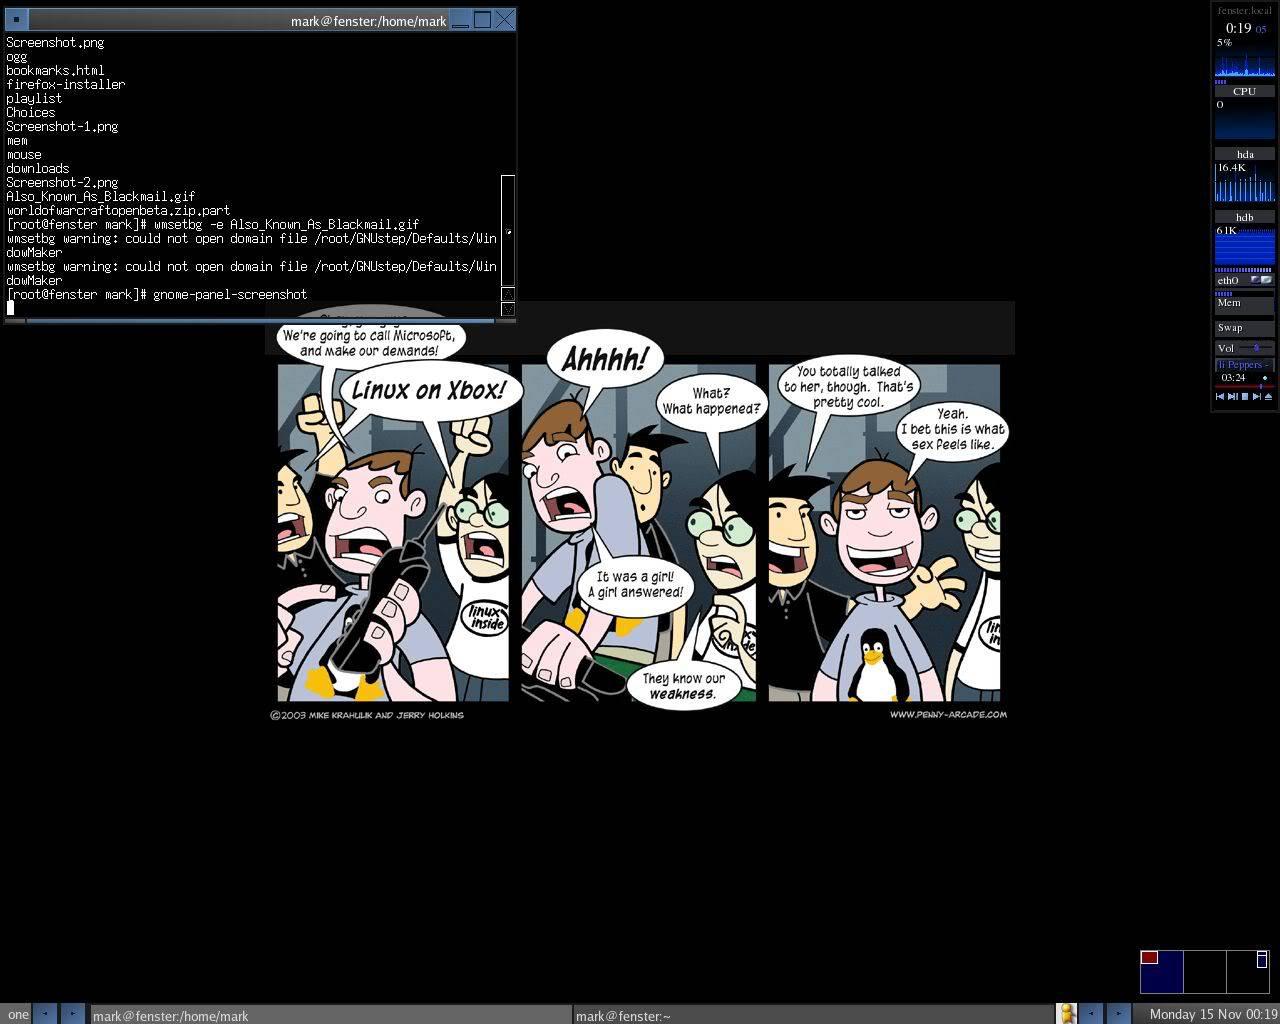 Fluxbox window manager on Gentoo Linux, Monday November 15 2004